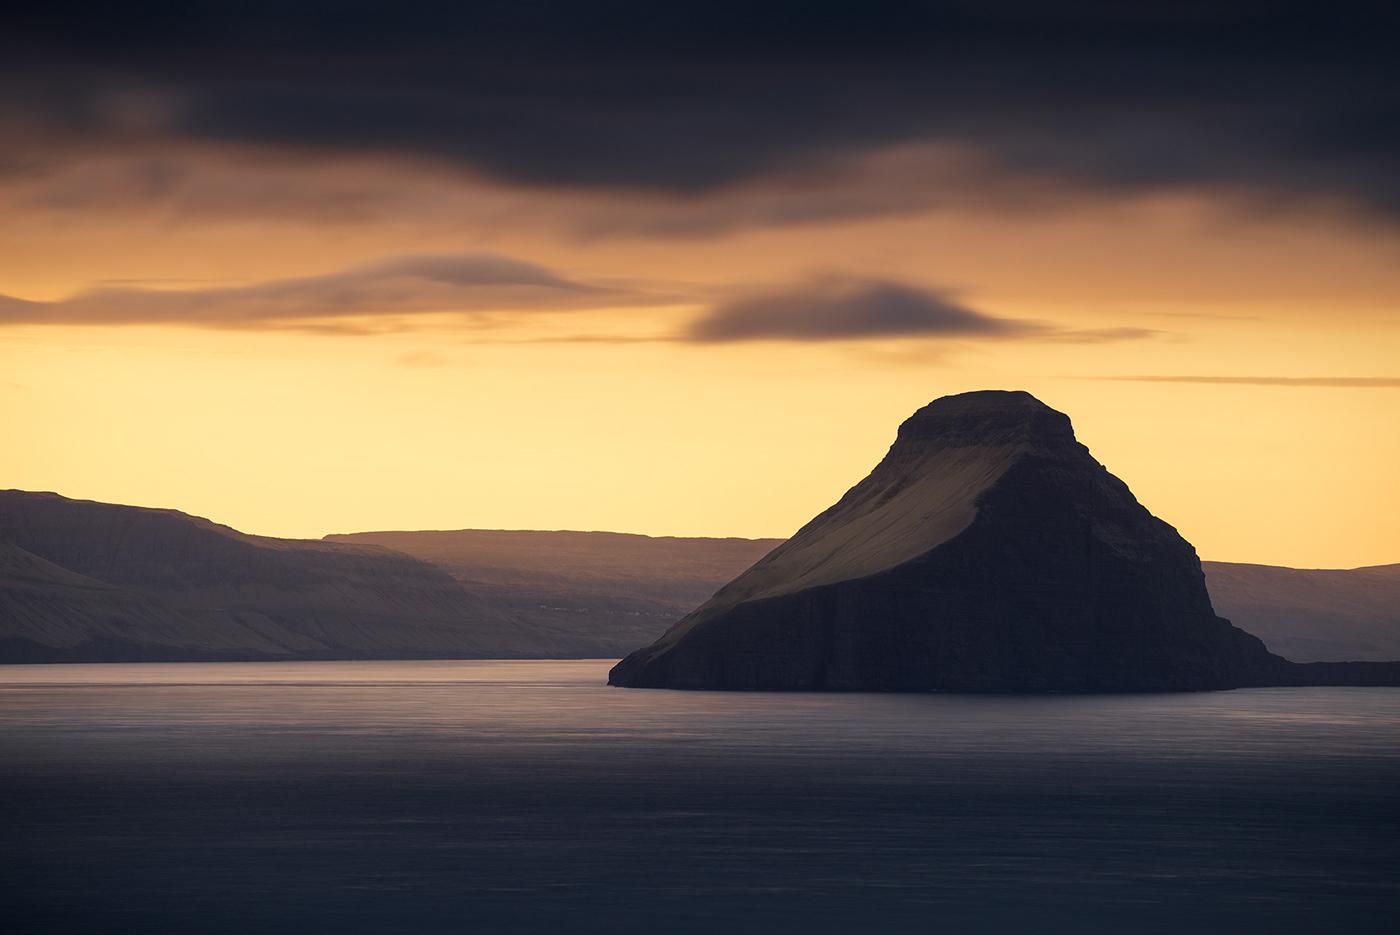 faroe islands landscape photography Photography  digital photography  storm photography Nature Landscape outdoors